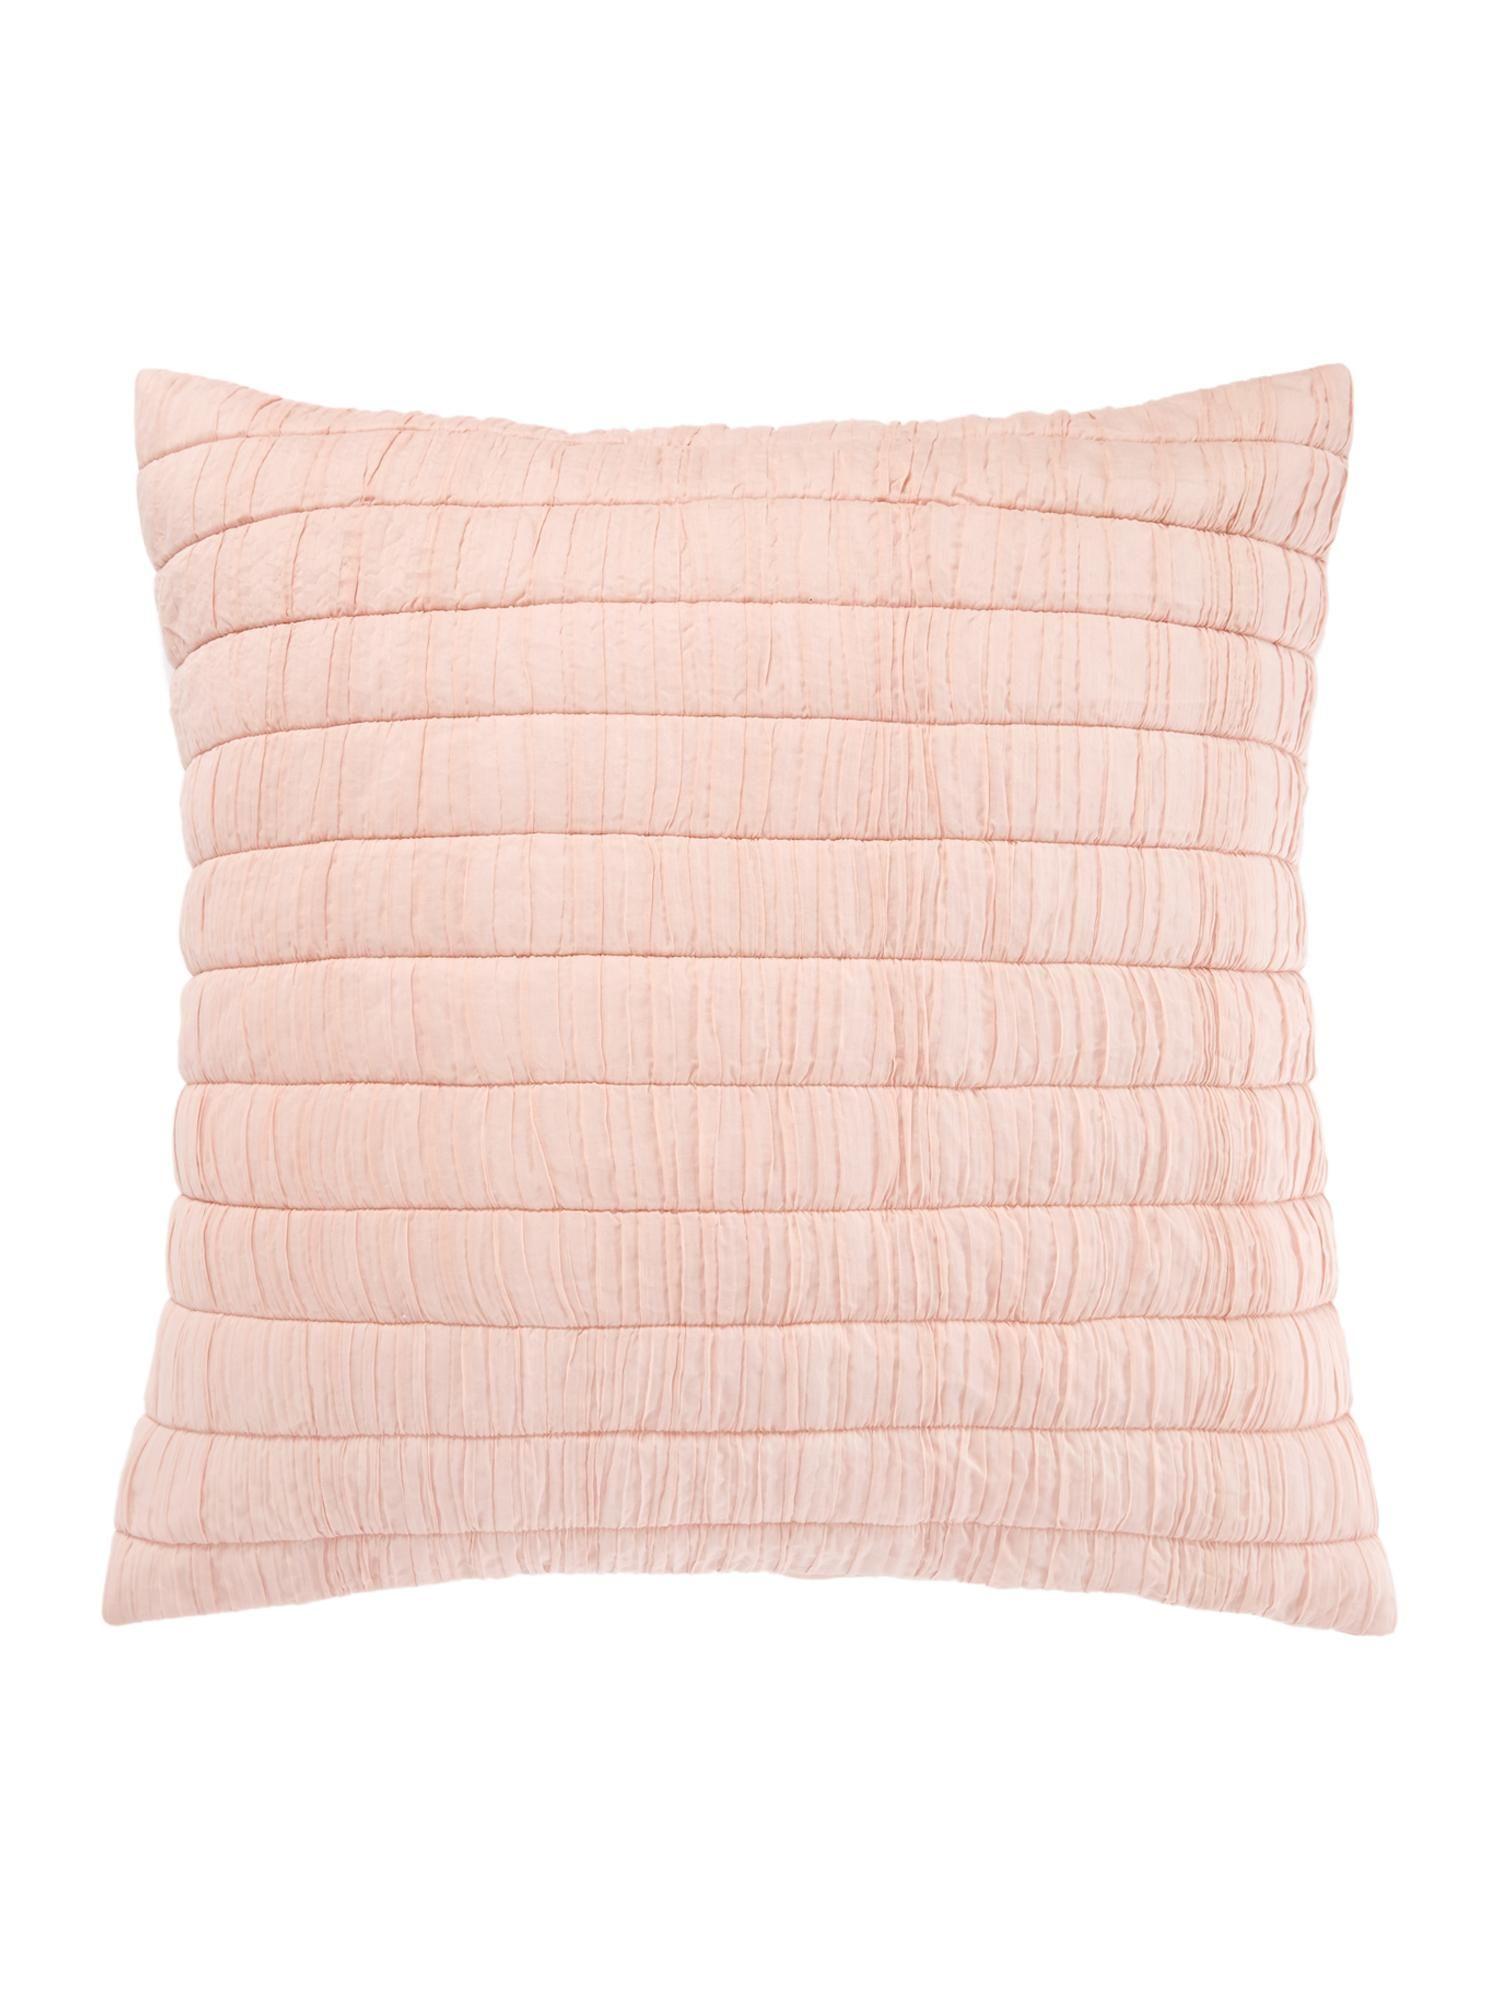 Junipa Aya Quilted Voile Sham Pink